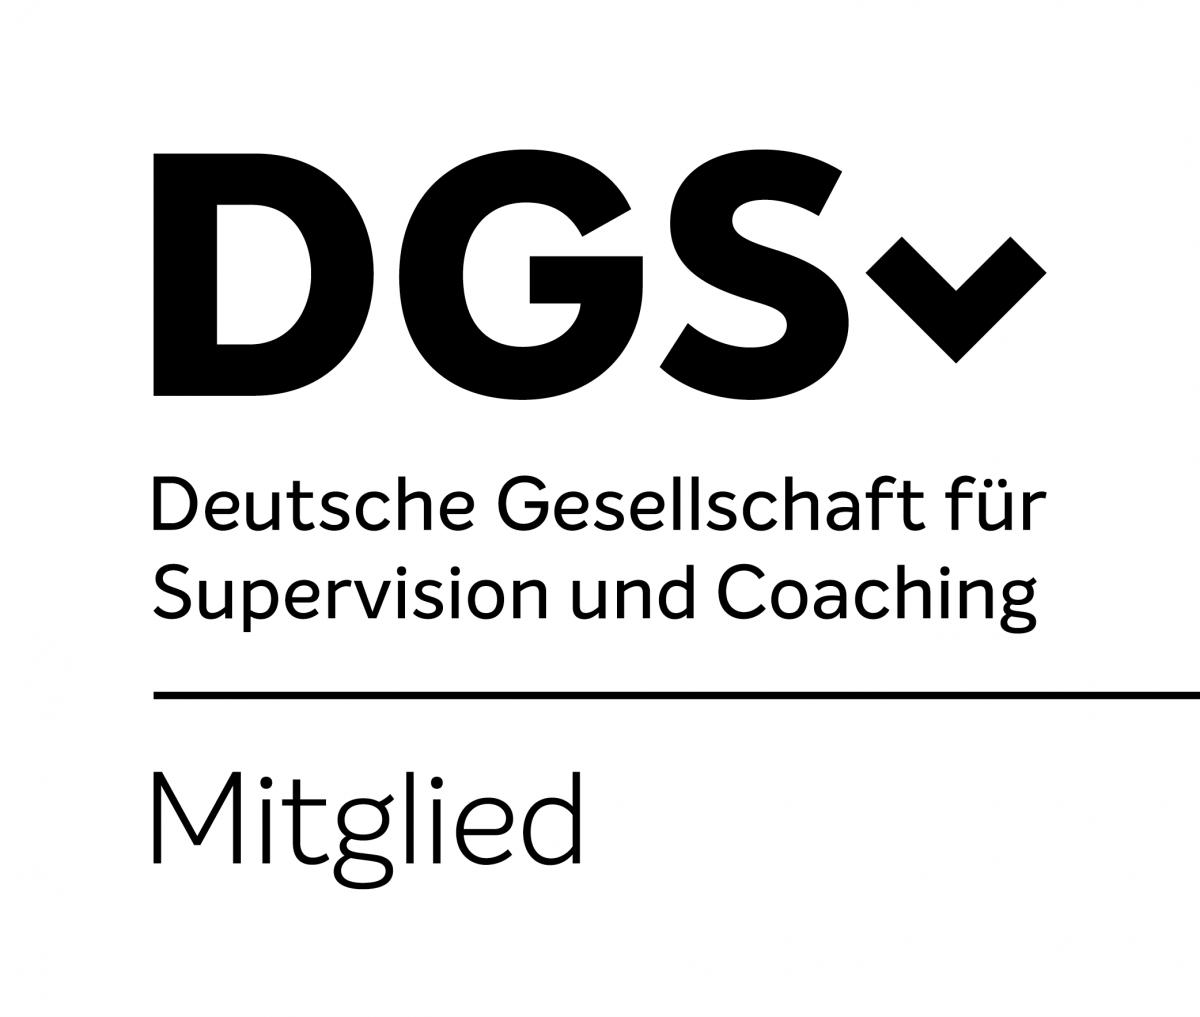 dgsv_black